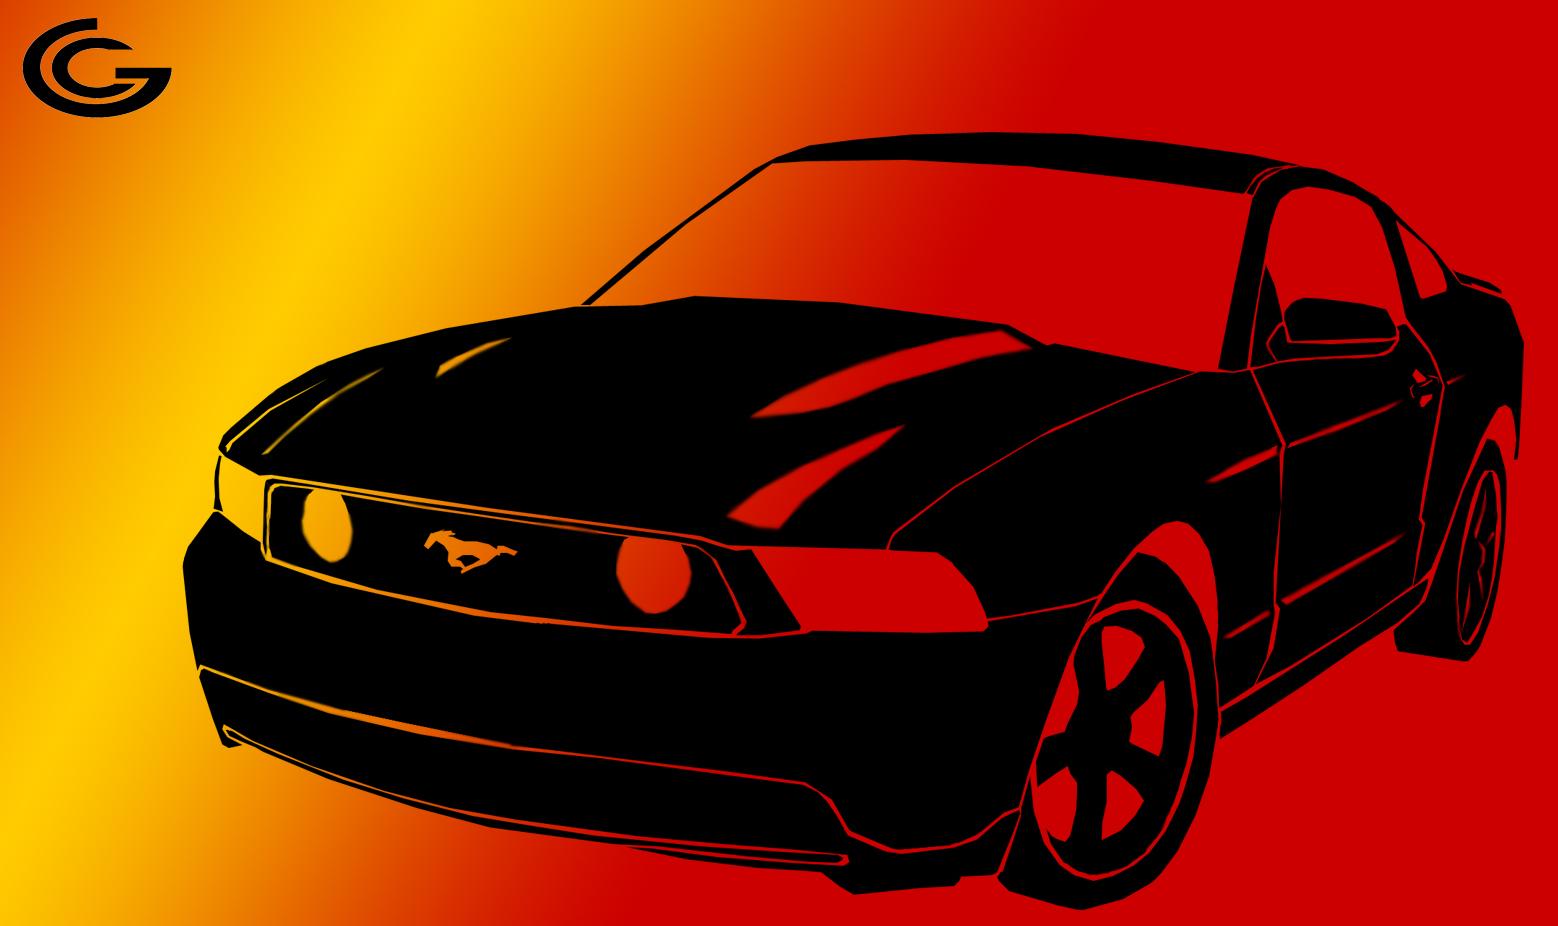 Mustang shadow